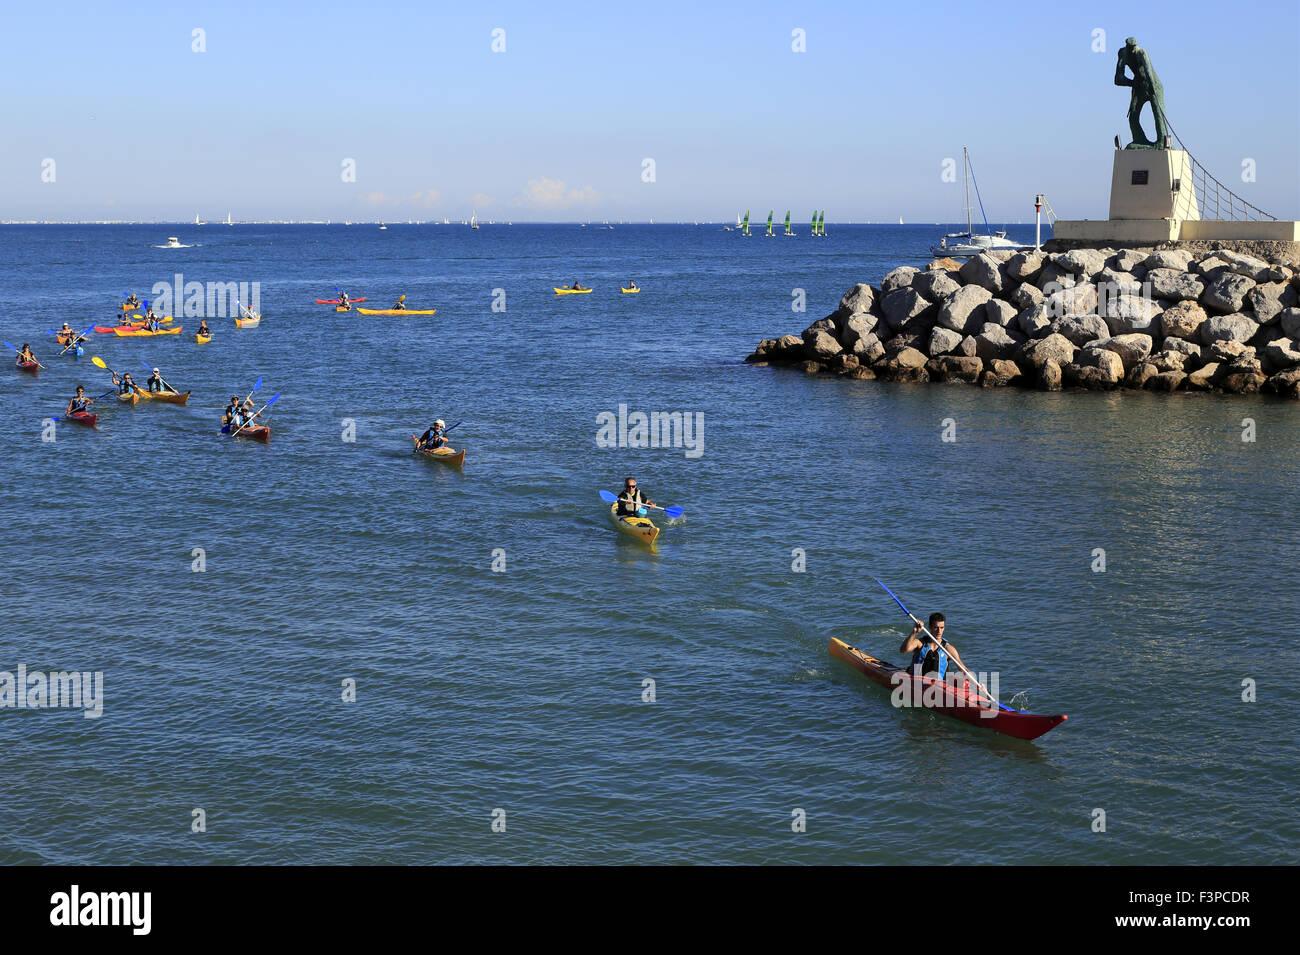 Palavas-Les-Flots, France, 10th October 2015. Output sea kayaking on the Mediterranean Sea. - Stock Image